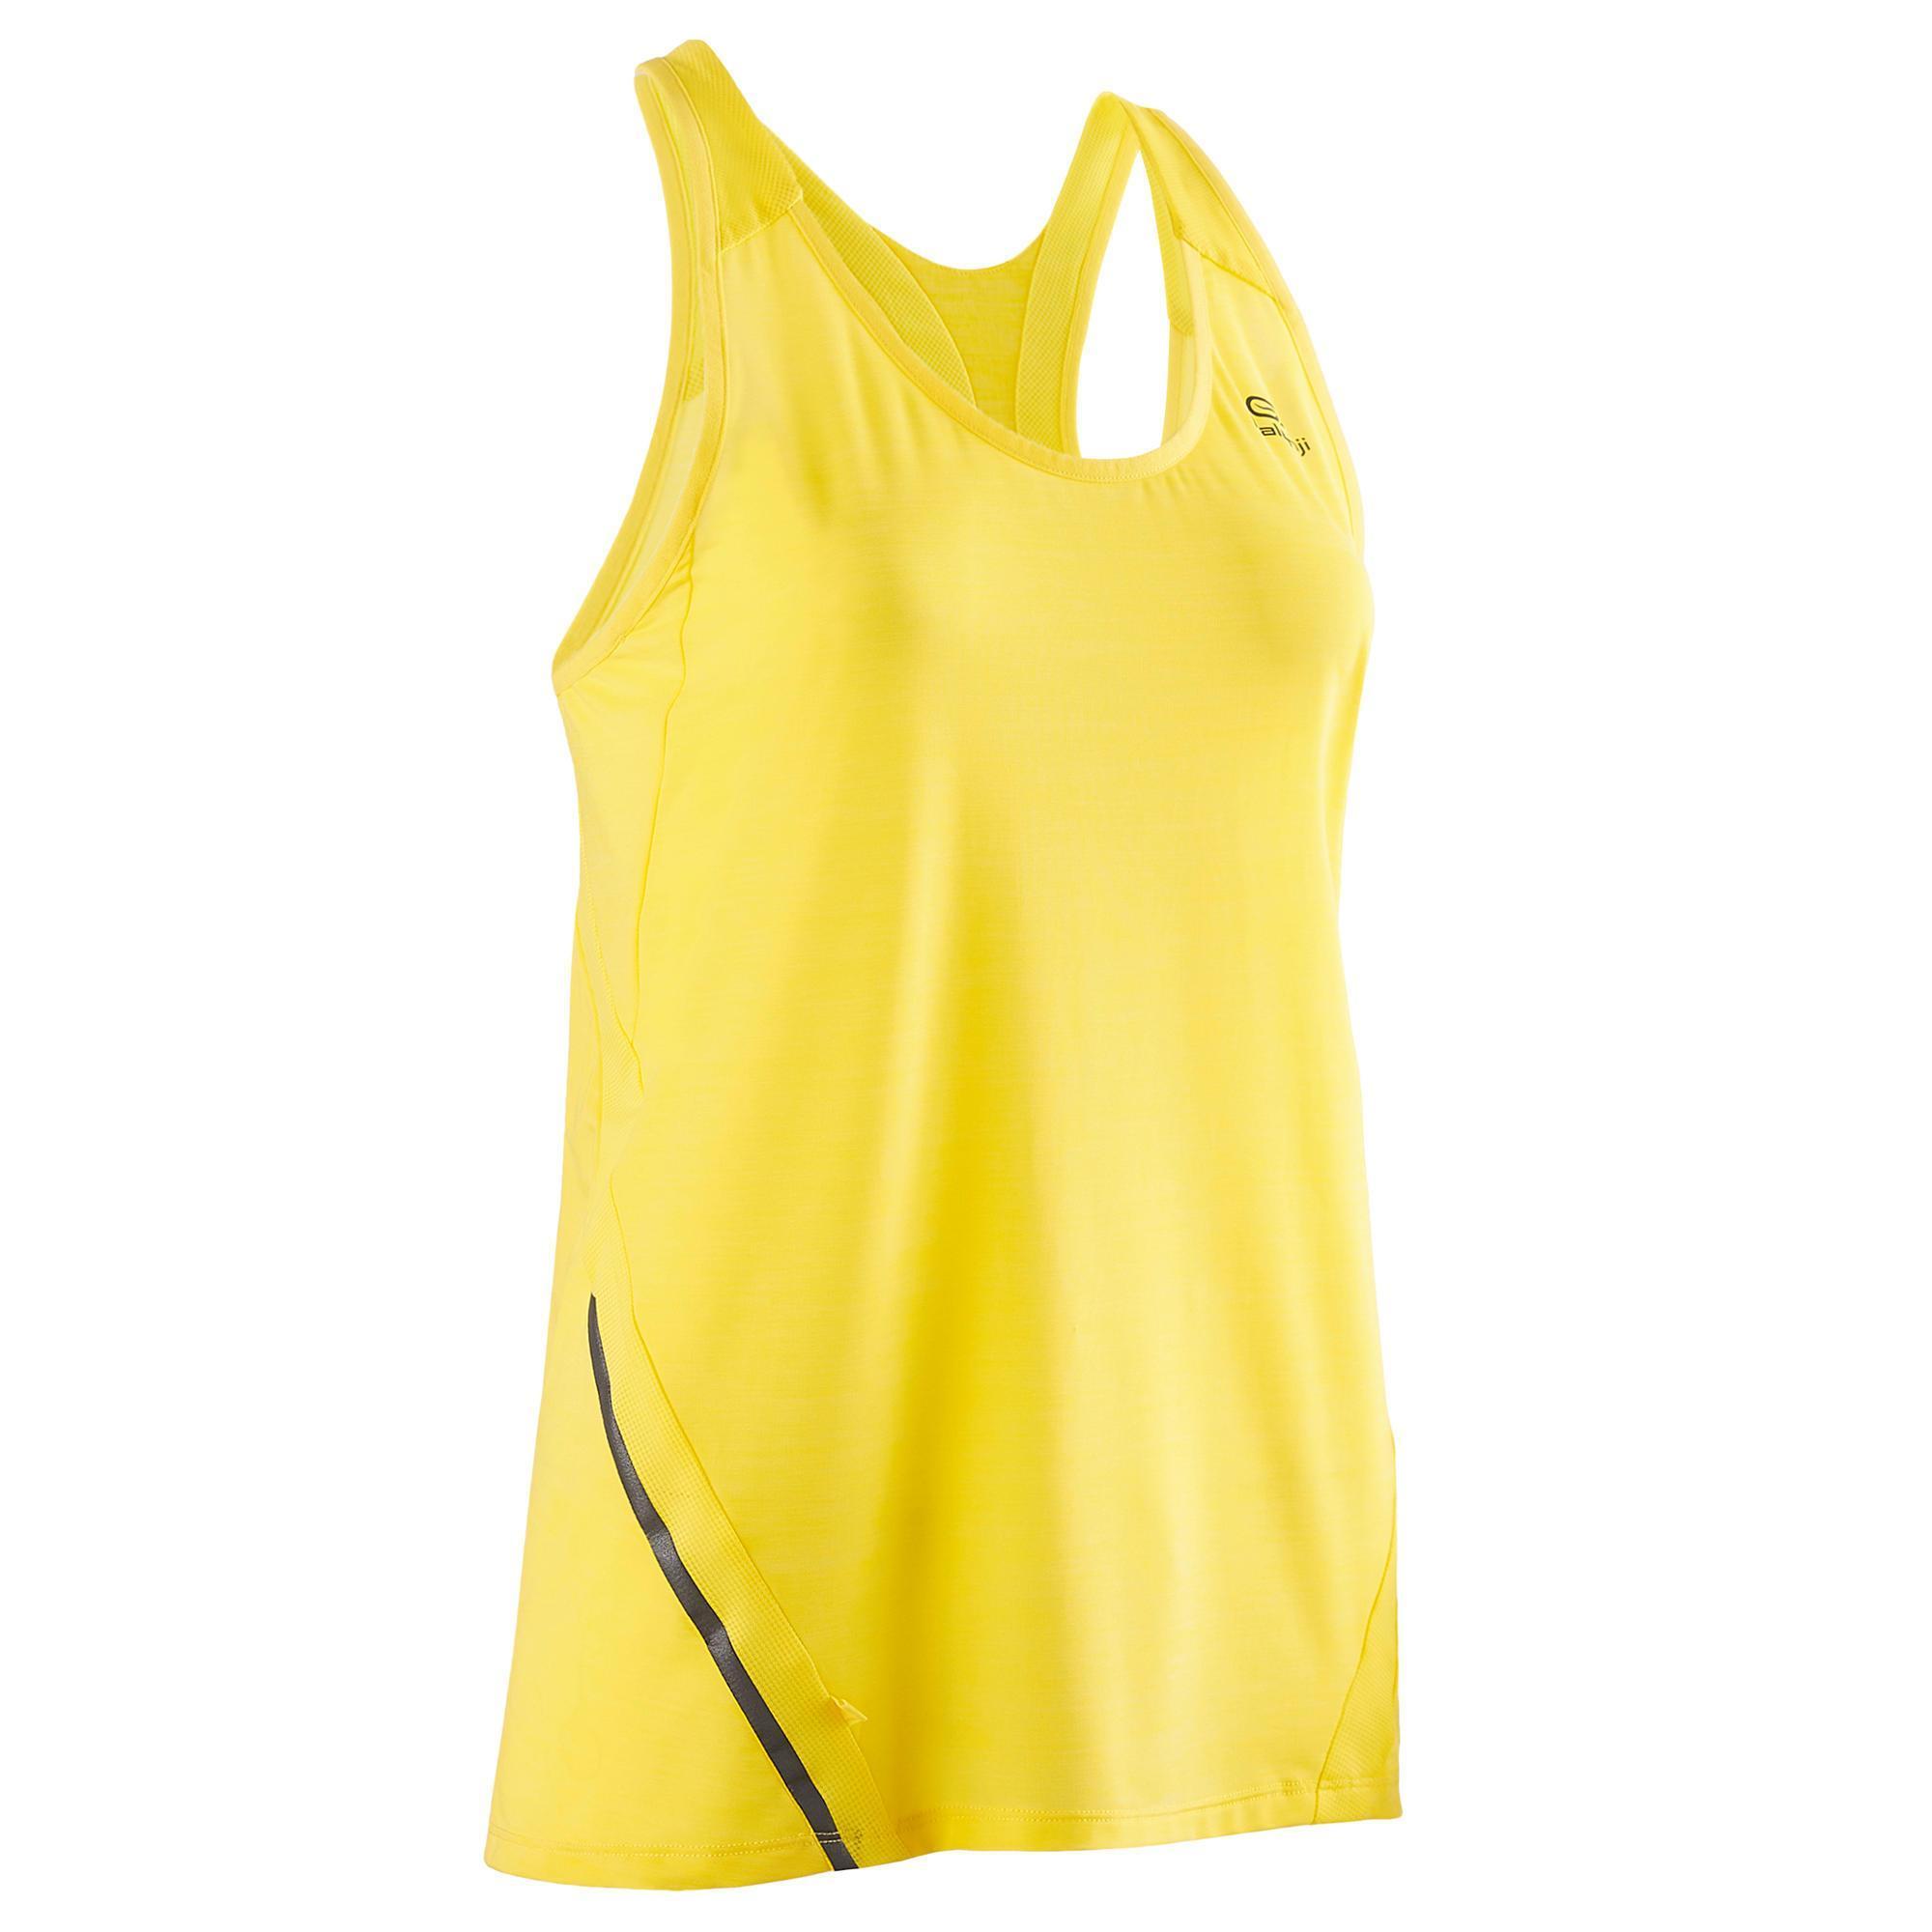 Lauftop Run Light Damen gelb | Sportbekleidung > Sporttops | Gelb | Baumwolle - Ab | Kalenji